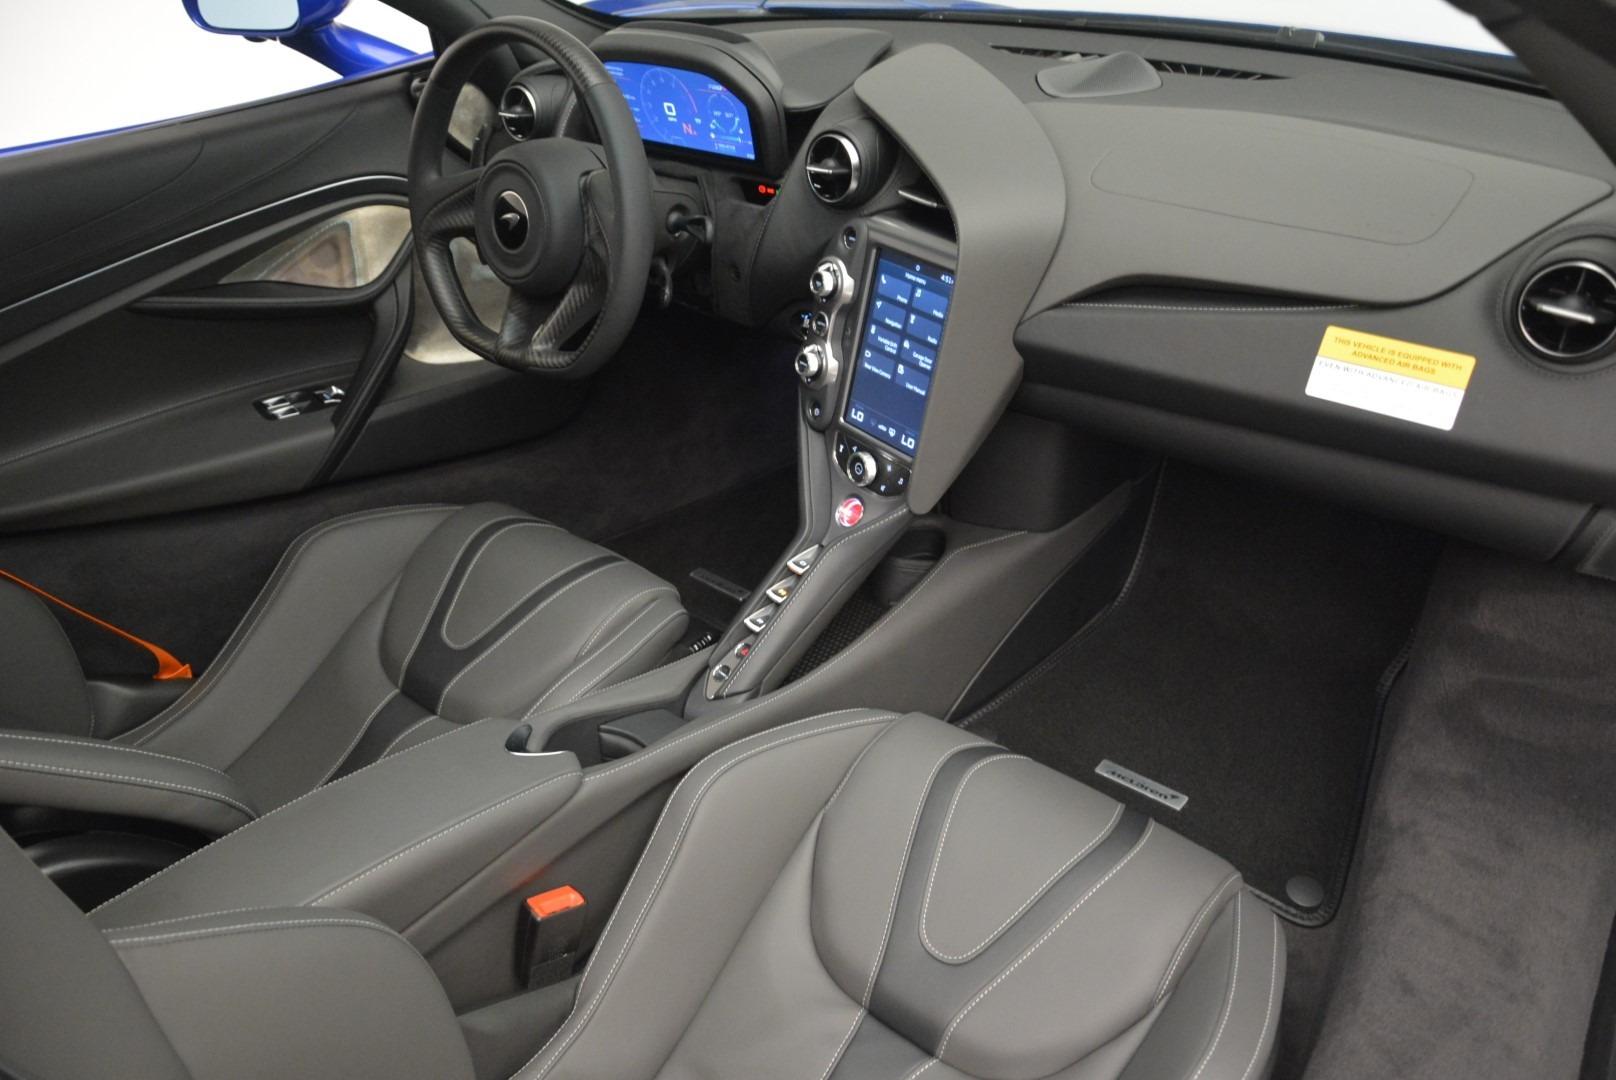 Used 2019 McLaren 720S Coupe For Sale In Westport, CT 2516_p19